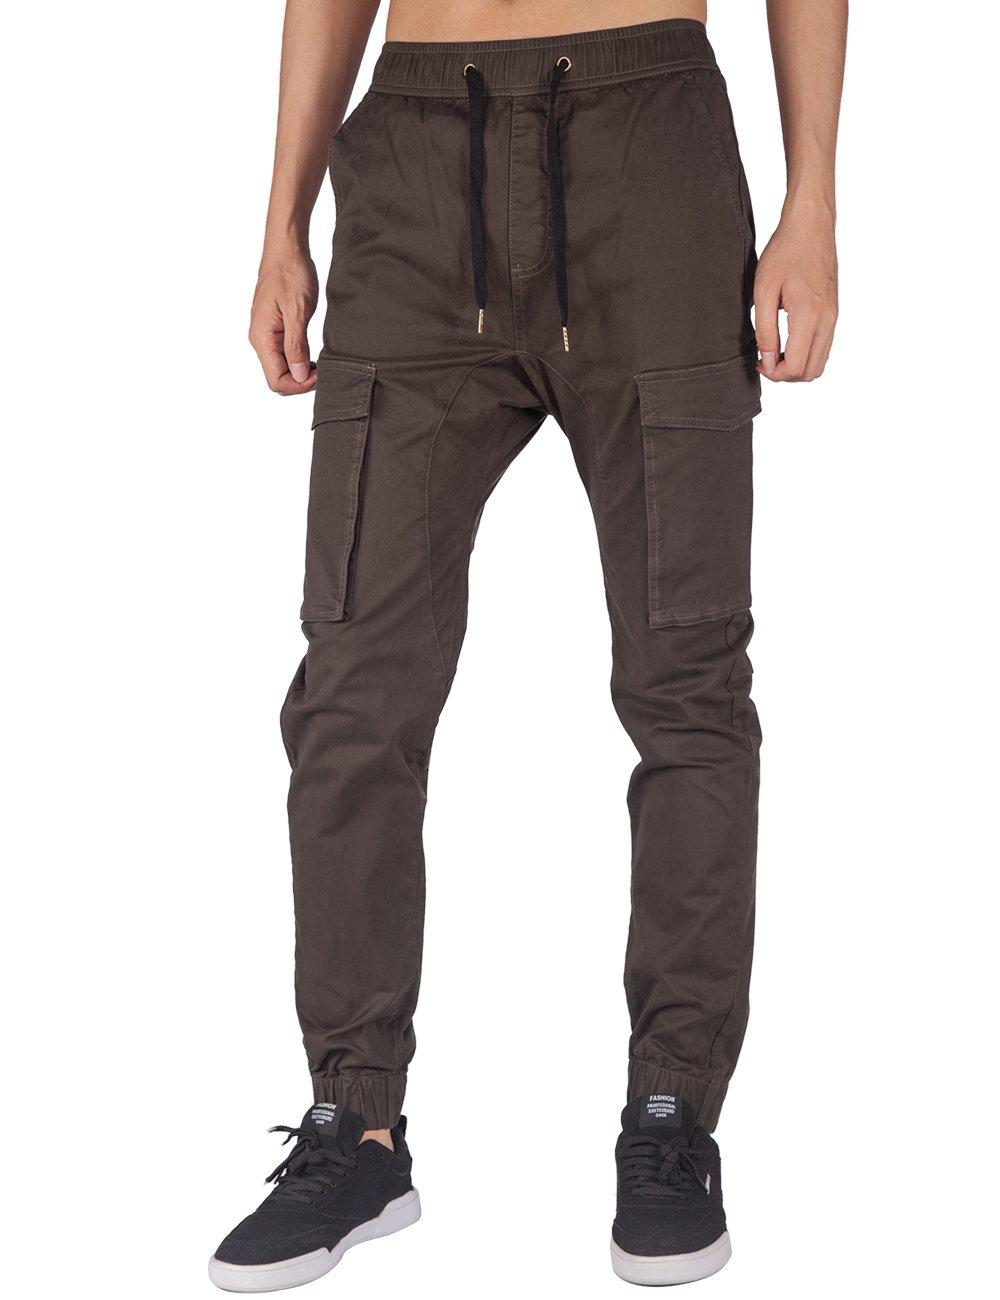 ITALY MORN Men's Jogger Cargo Pants Elastic Waist (Peat Grey, M)